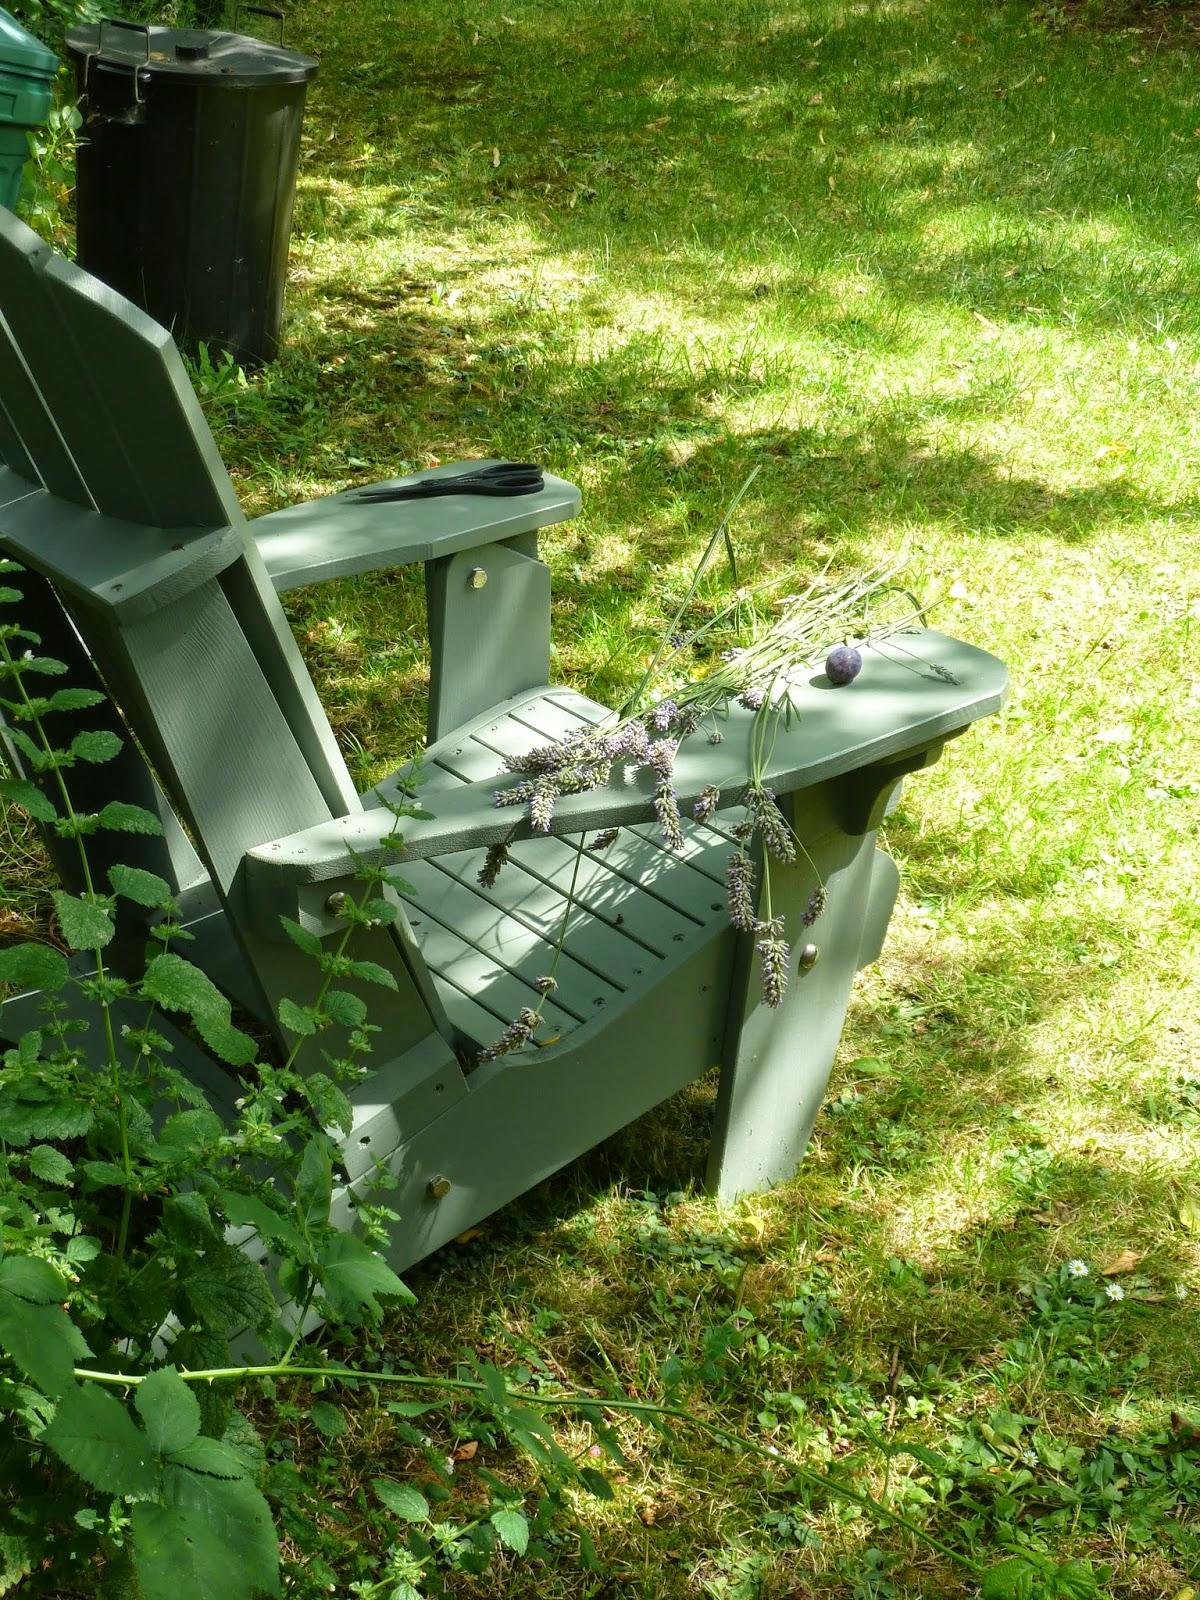 Perfect garden seat